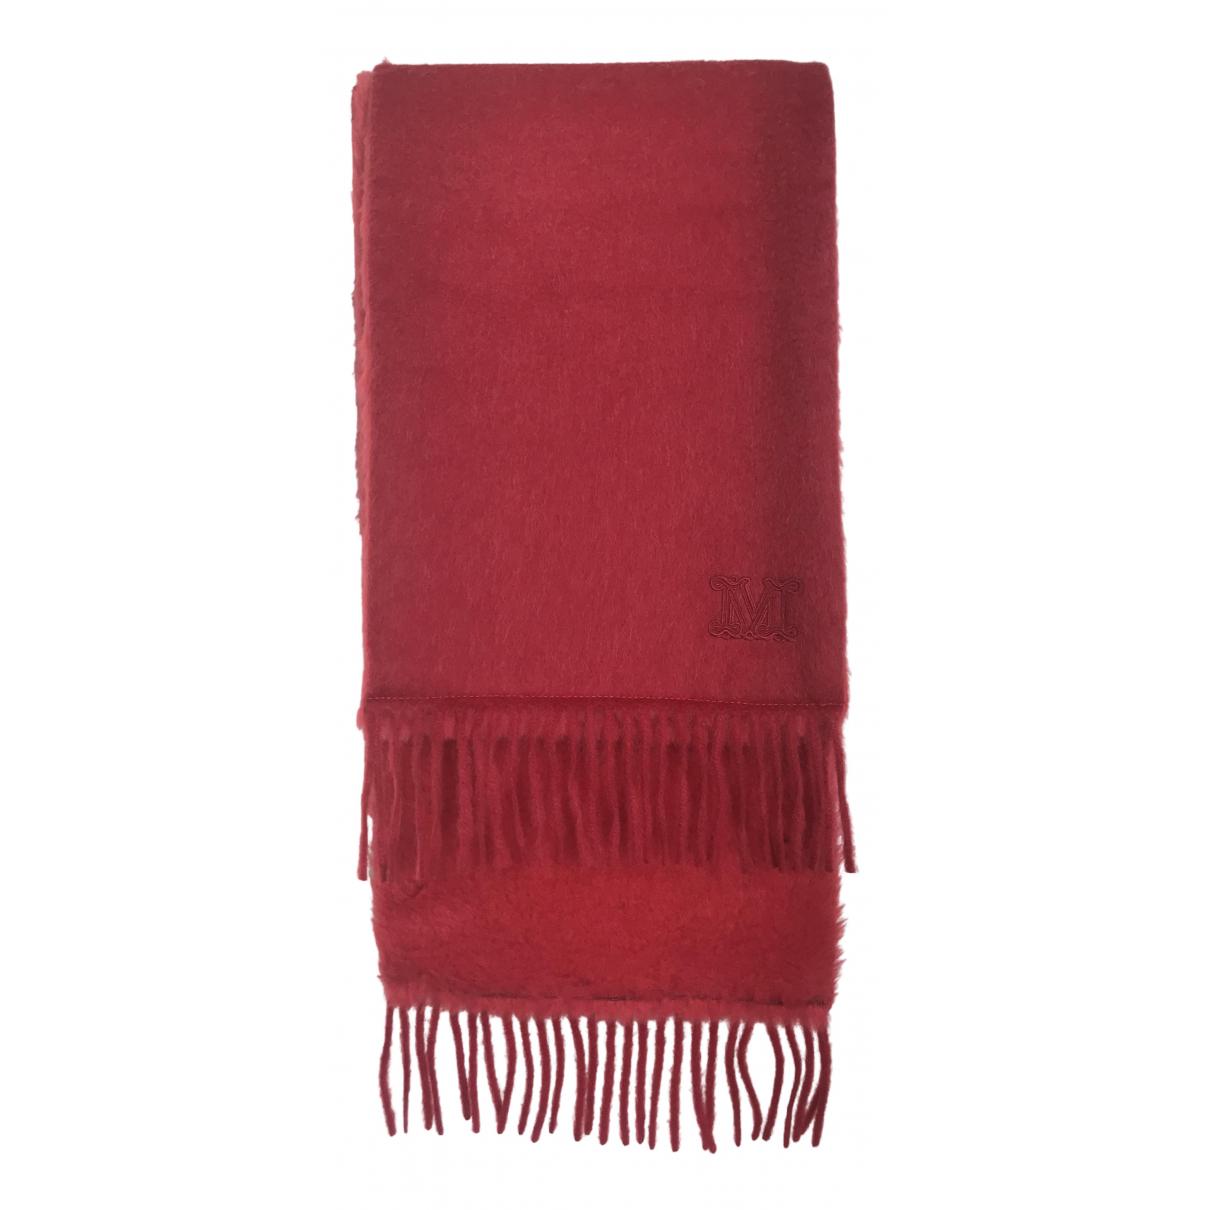 Max Mara Max Mara Atelier Red Wool scarf for Women \N